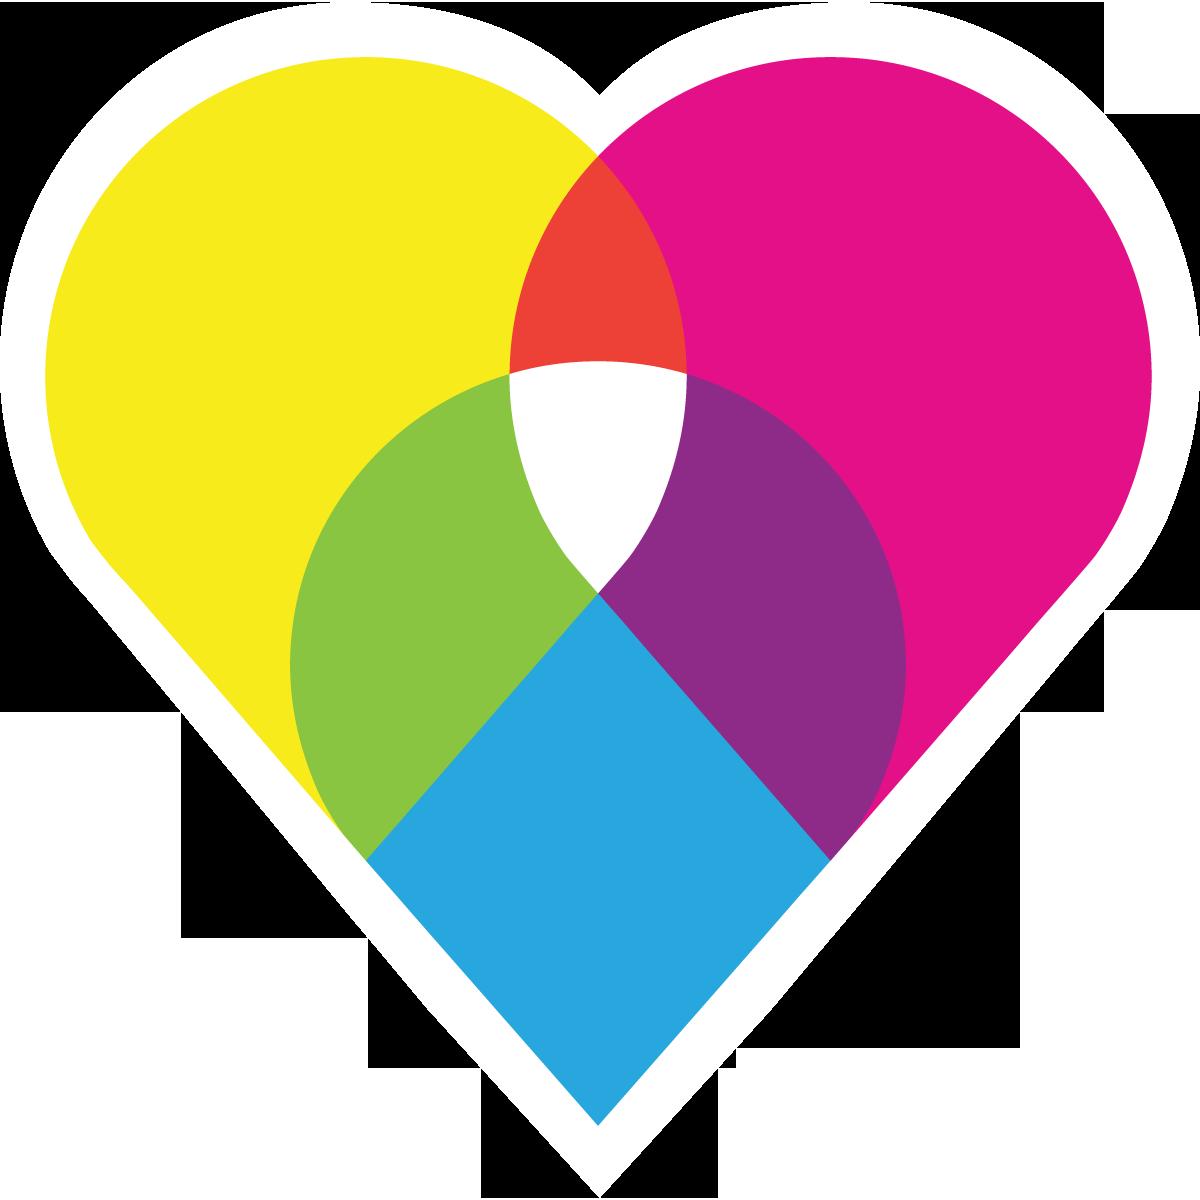 create 2d logo design by symonds1